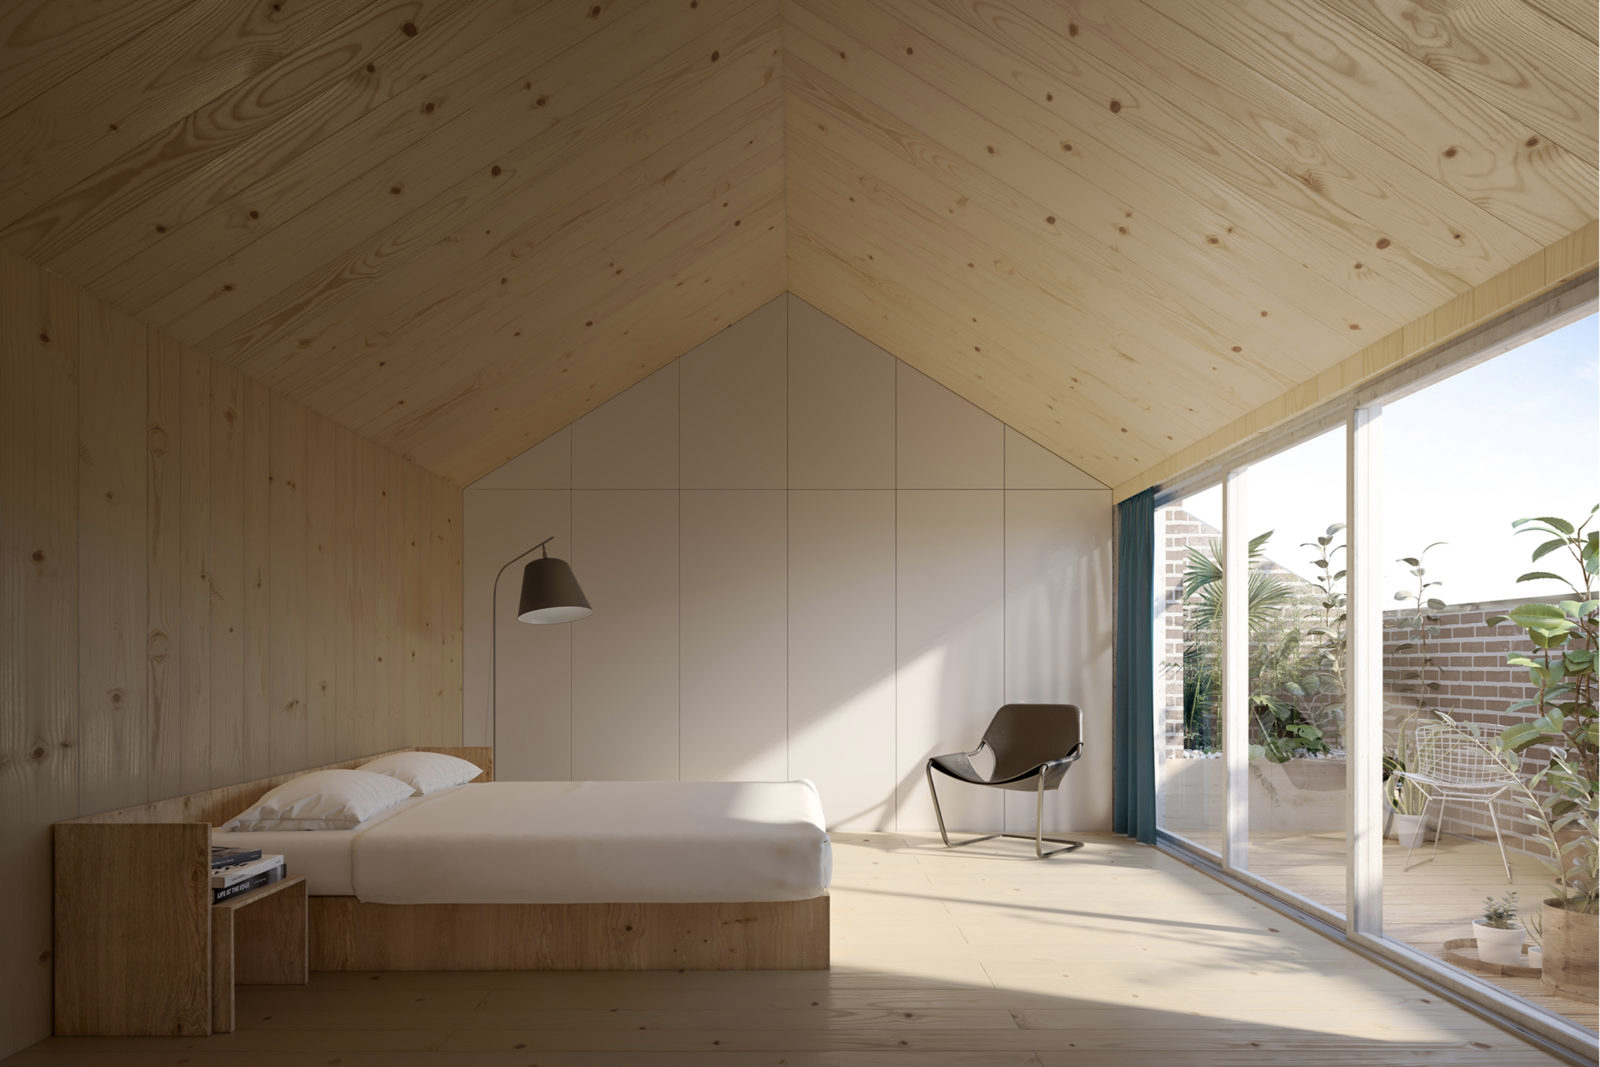 CGI by Carl Turner Architects. Via The Modern House